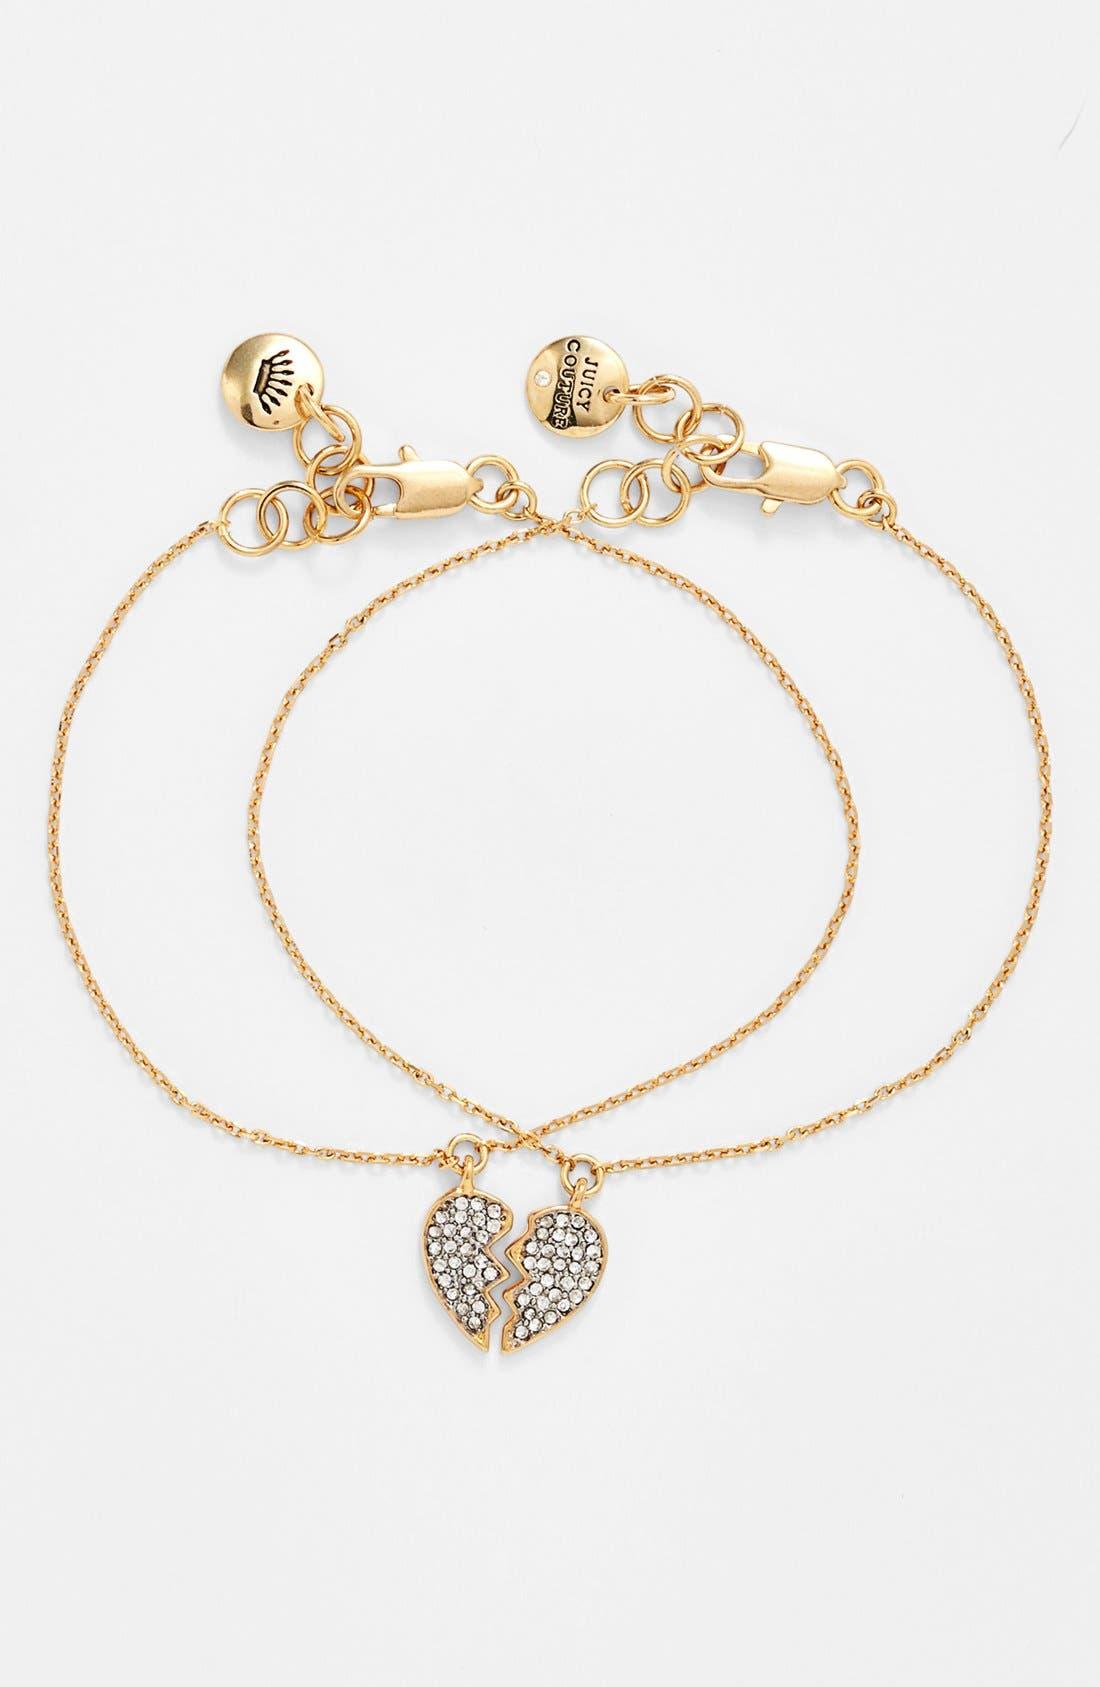 Main Image - Juicy Couture 'Signatures' Friendship Charm Bracelets (Set of 2)